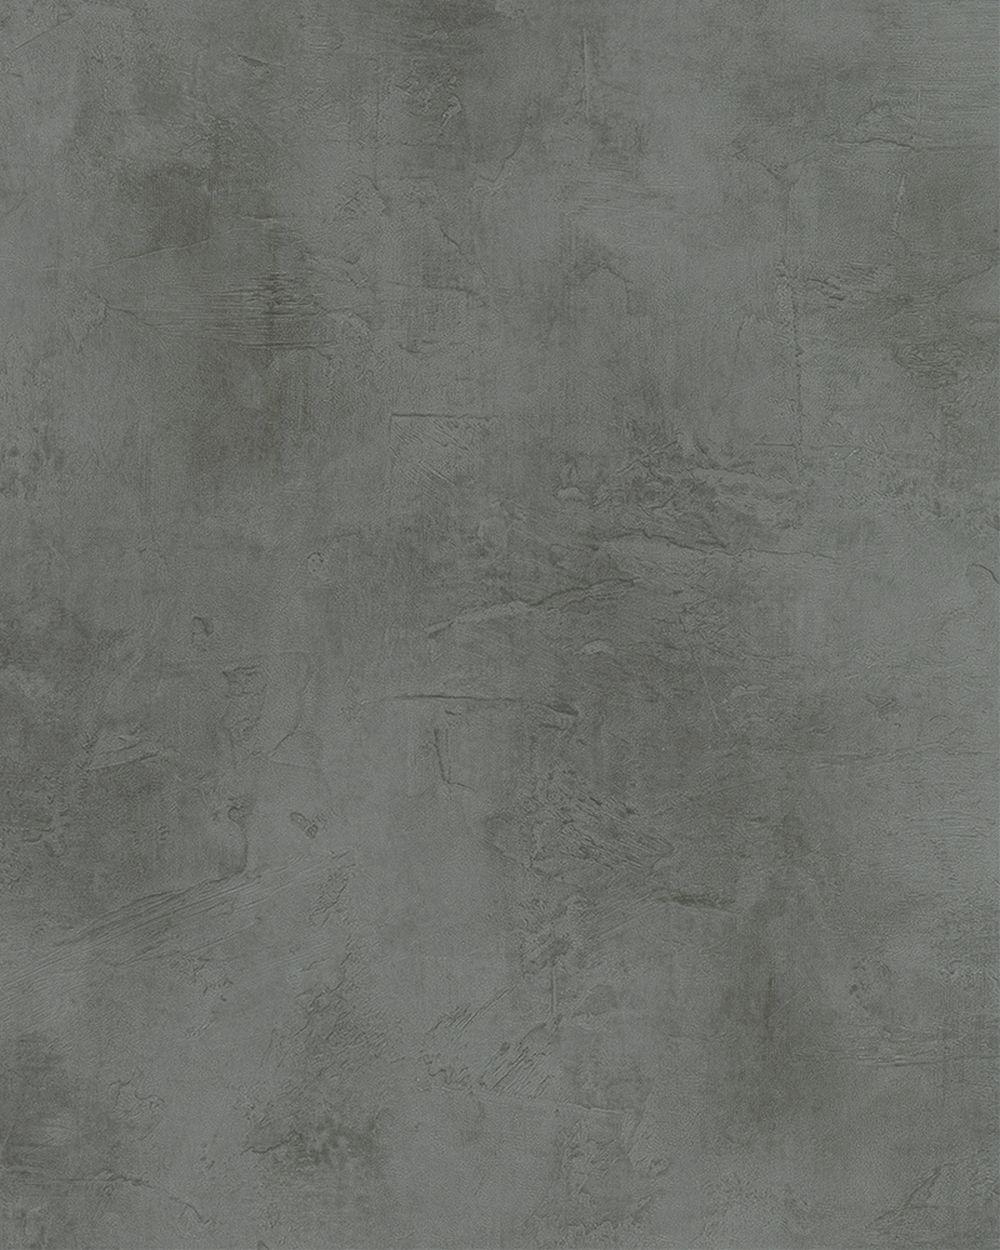 tapete vlies vintage putz optik anthrazit marburg 59311. Black Bedroom Furniture Sets. Home Design Ideas